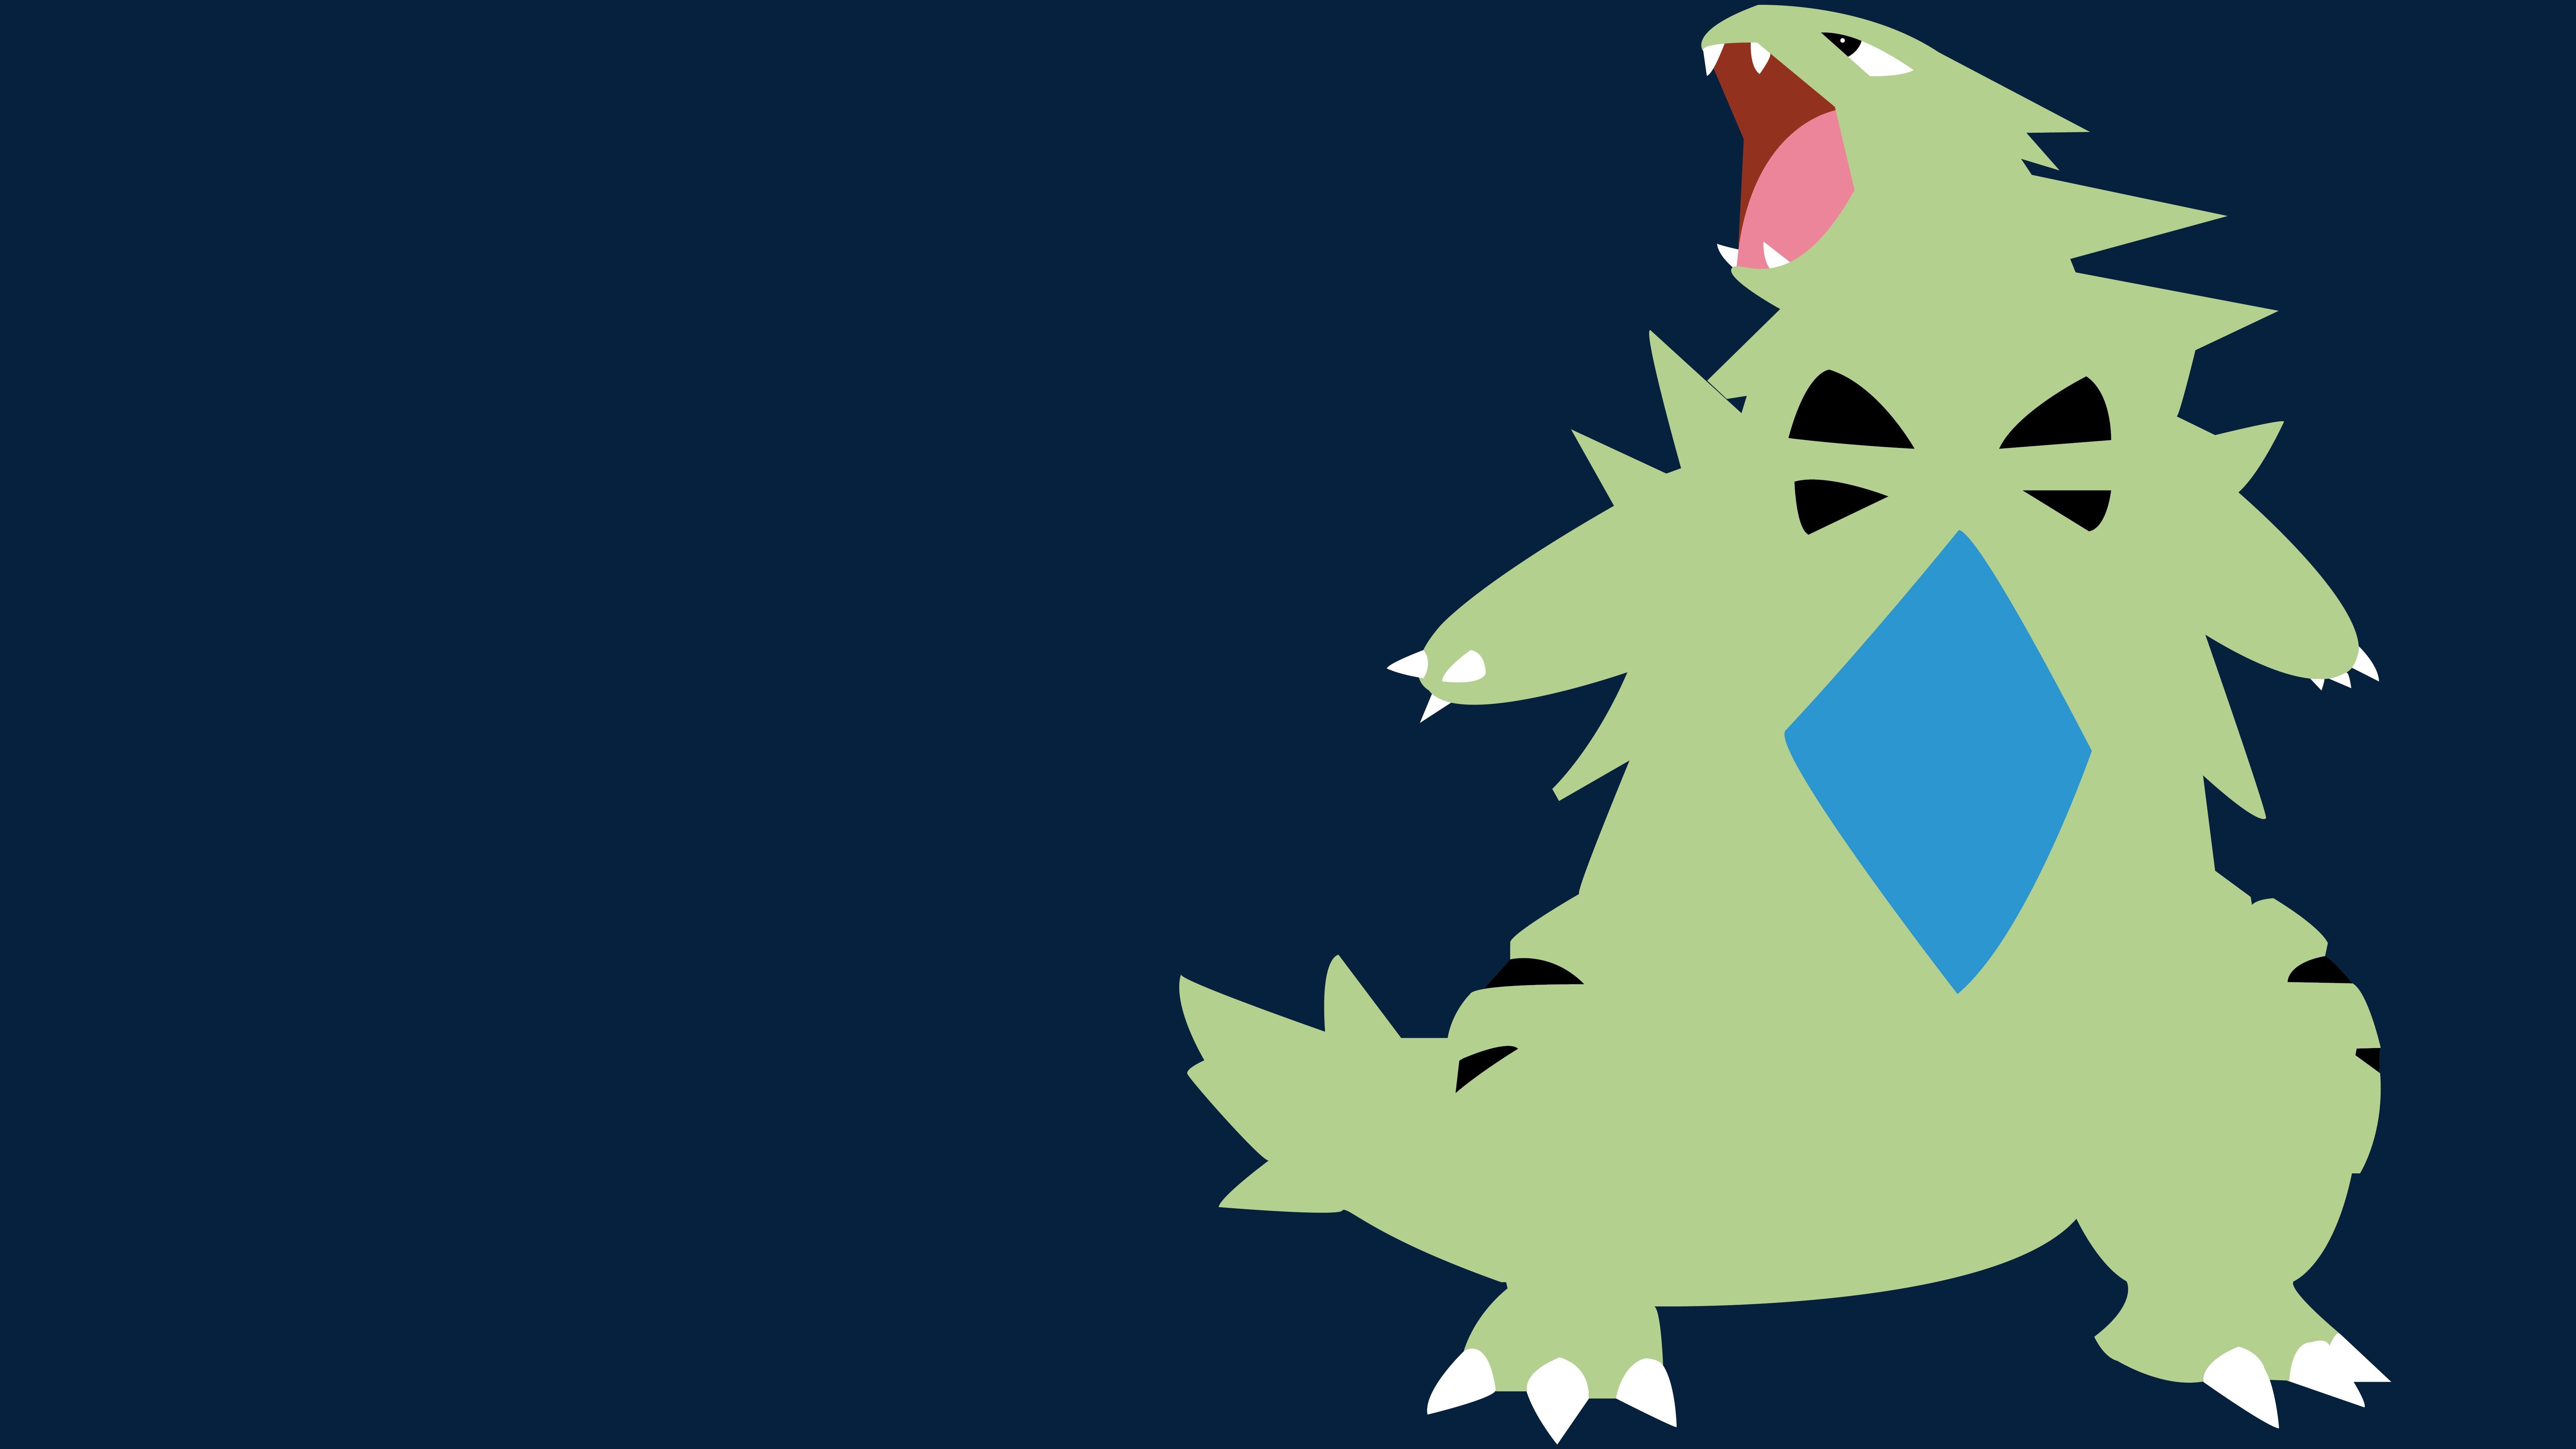 8000x4500 Px Minimalism Pokemon Second Generation Tyranitar